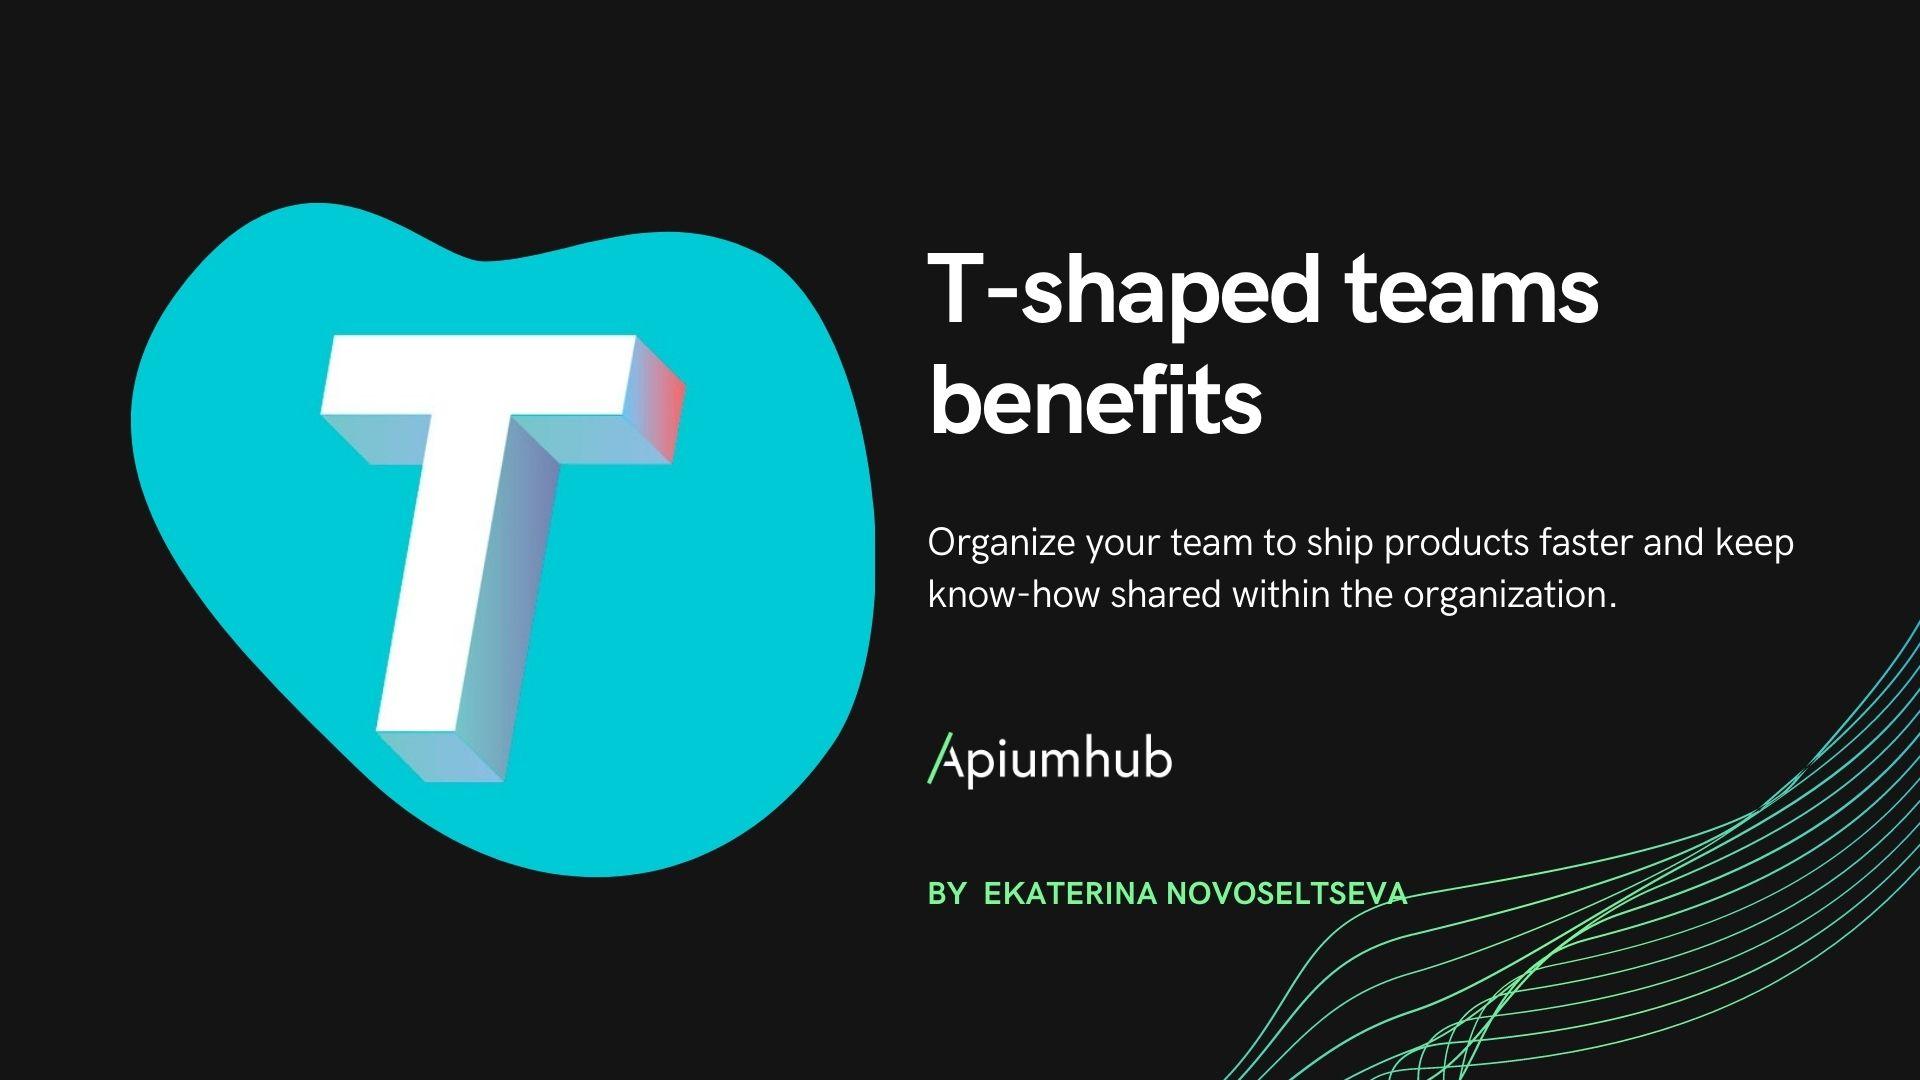 T-shaped teams benefits